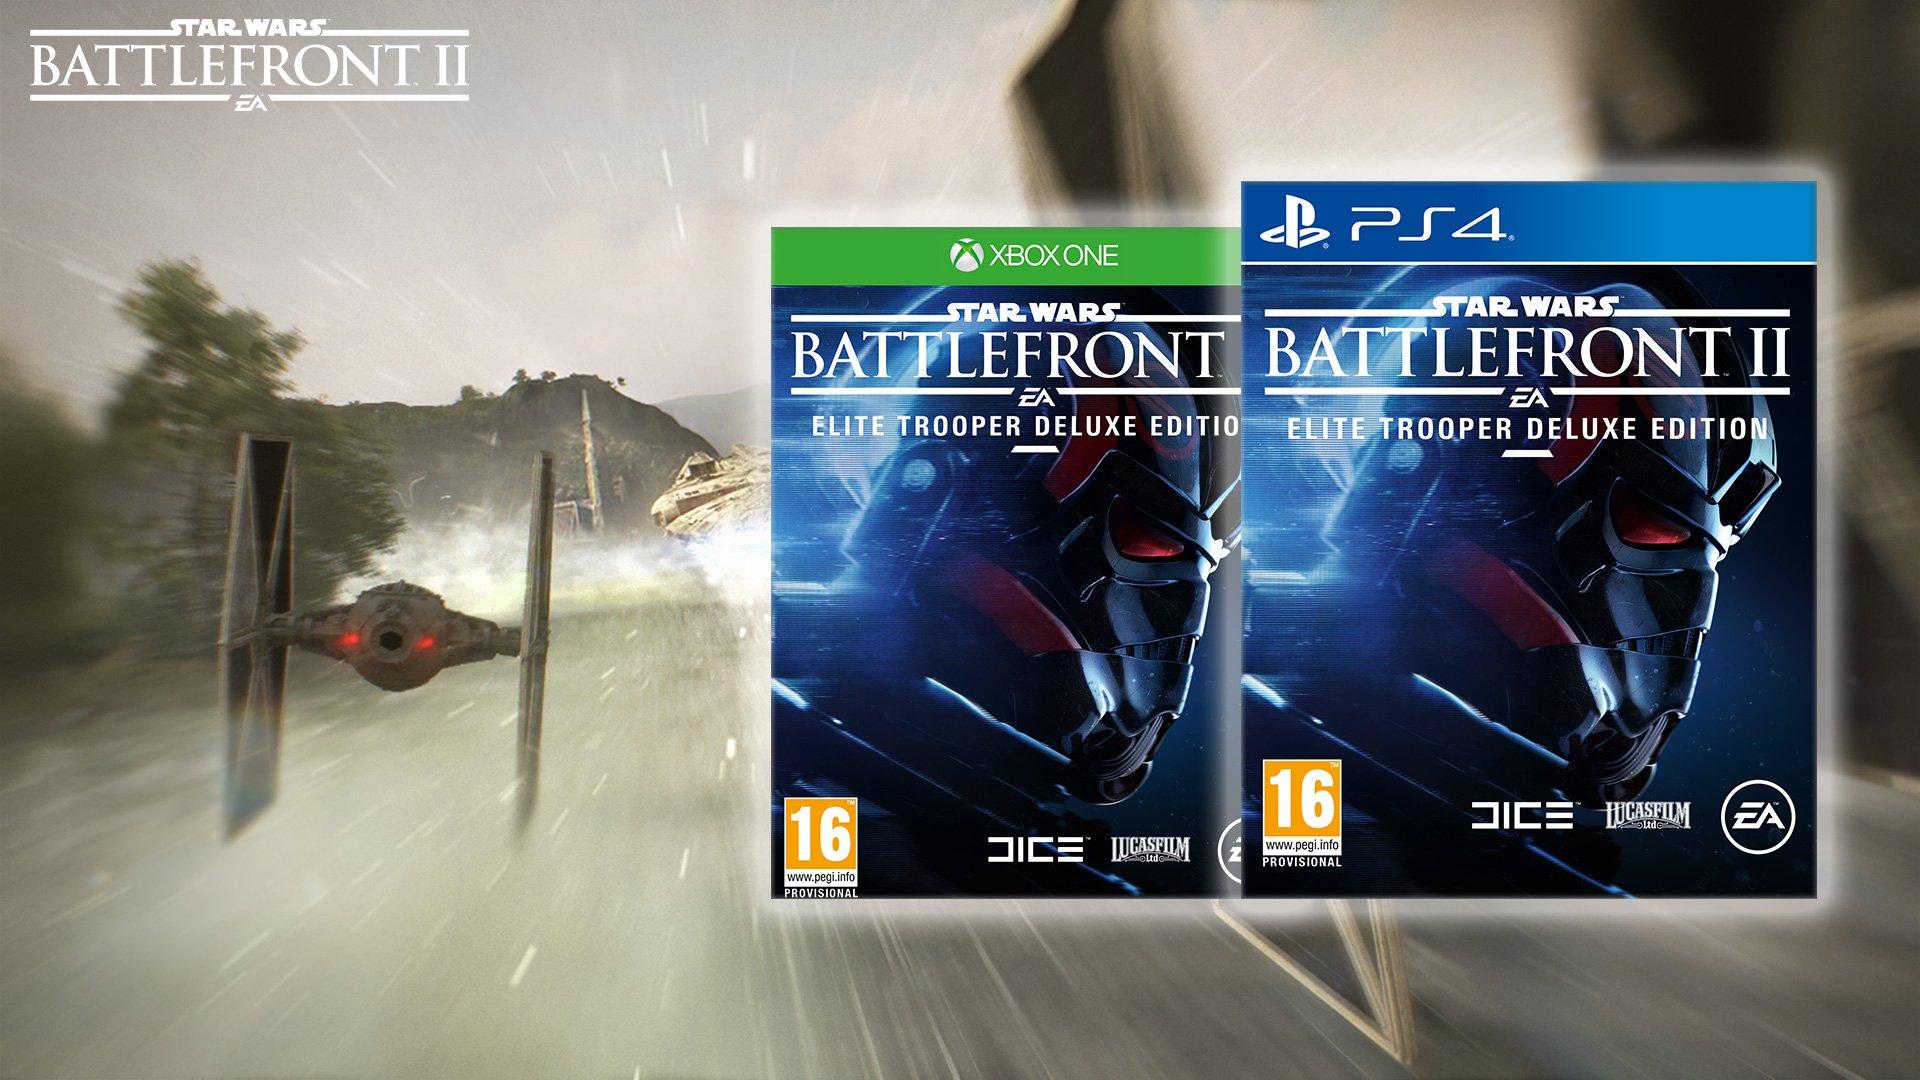 Star Wars Battlefront II Elite Trooper - Deluxe Day-One Limited